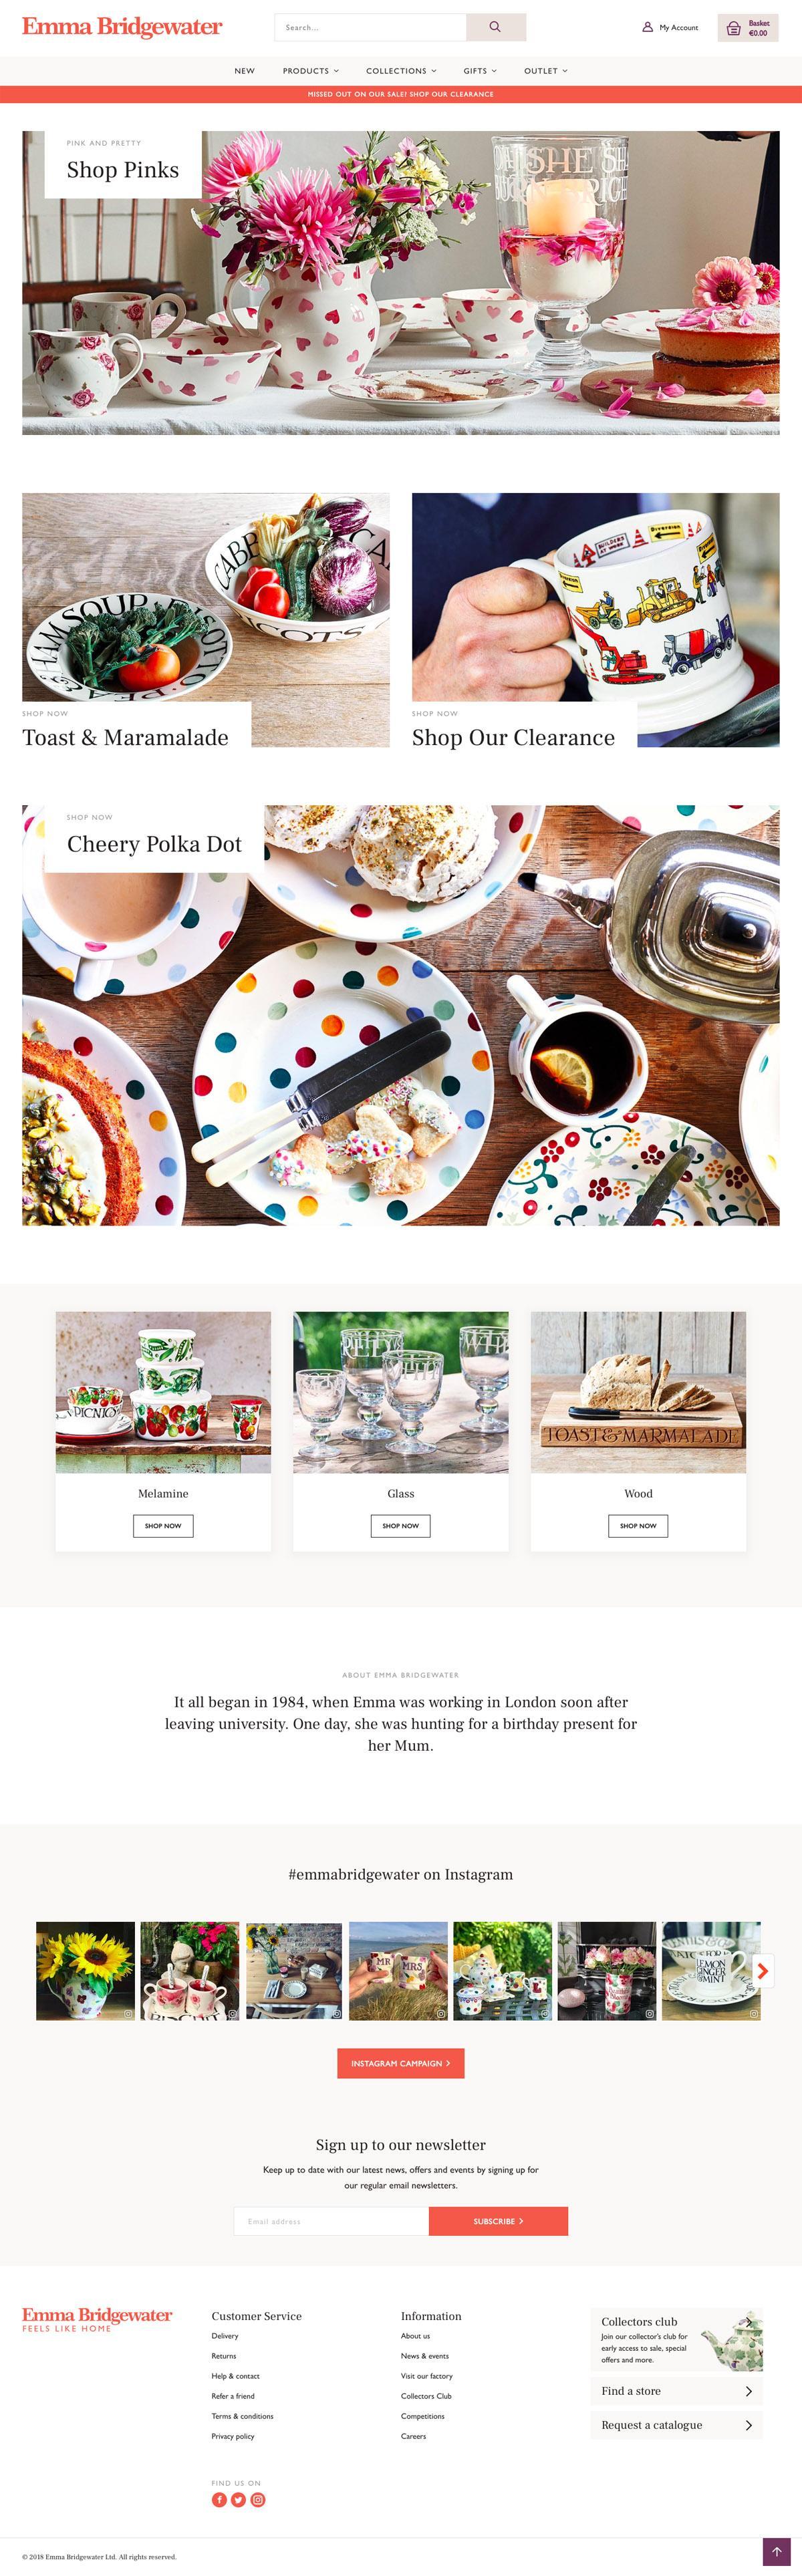 eCommerce website: Emma Bridgewater